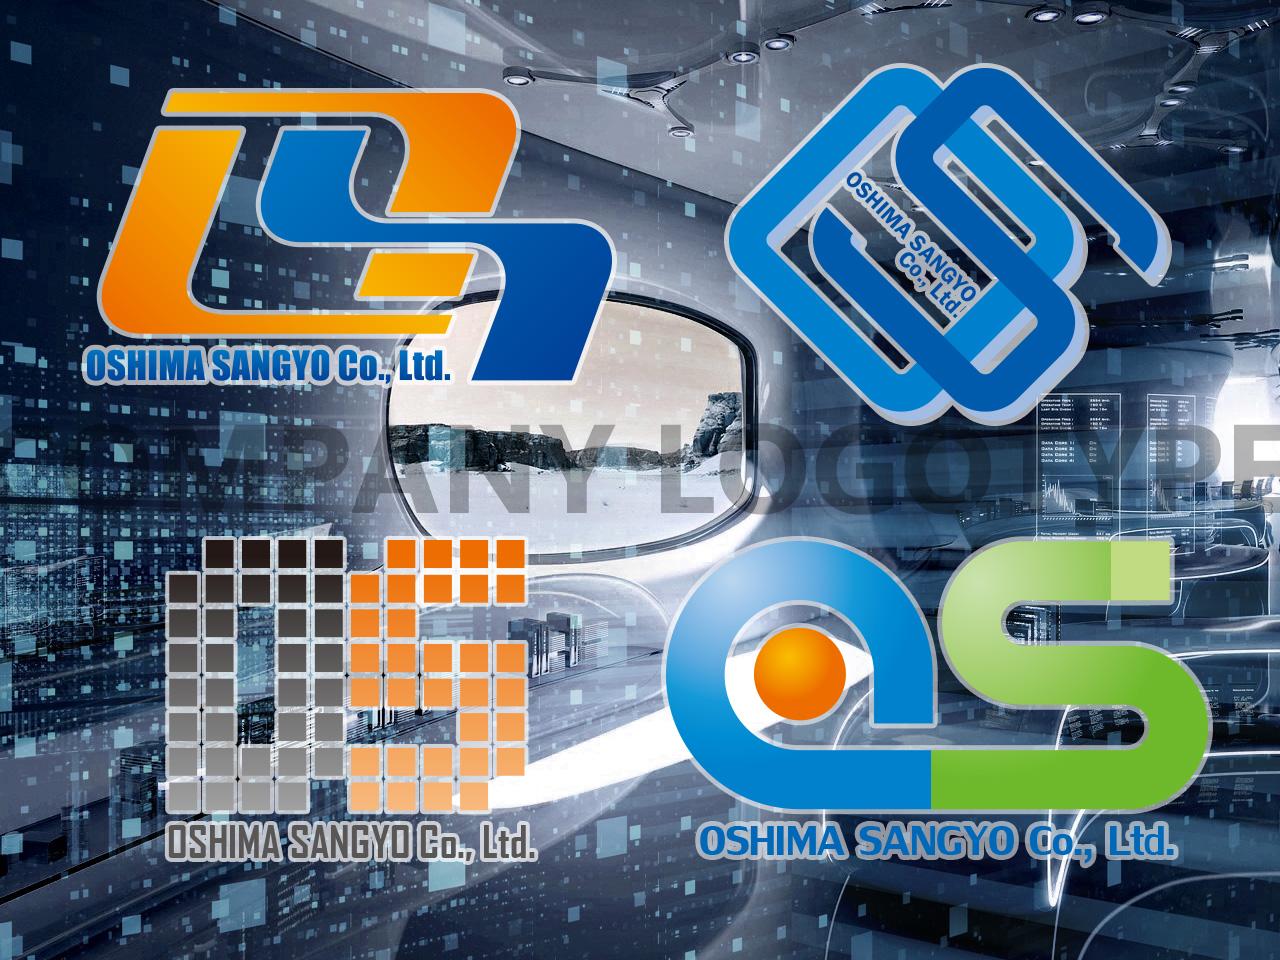 OSHIMA SANGYO Co., Ltd. Logotype